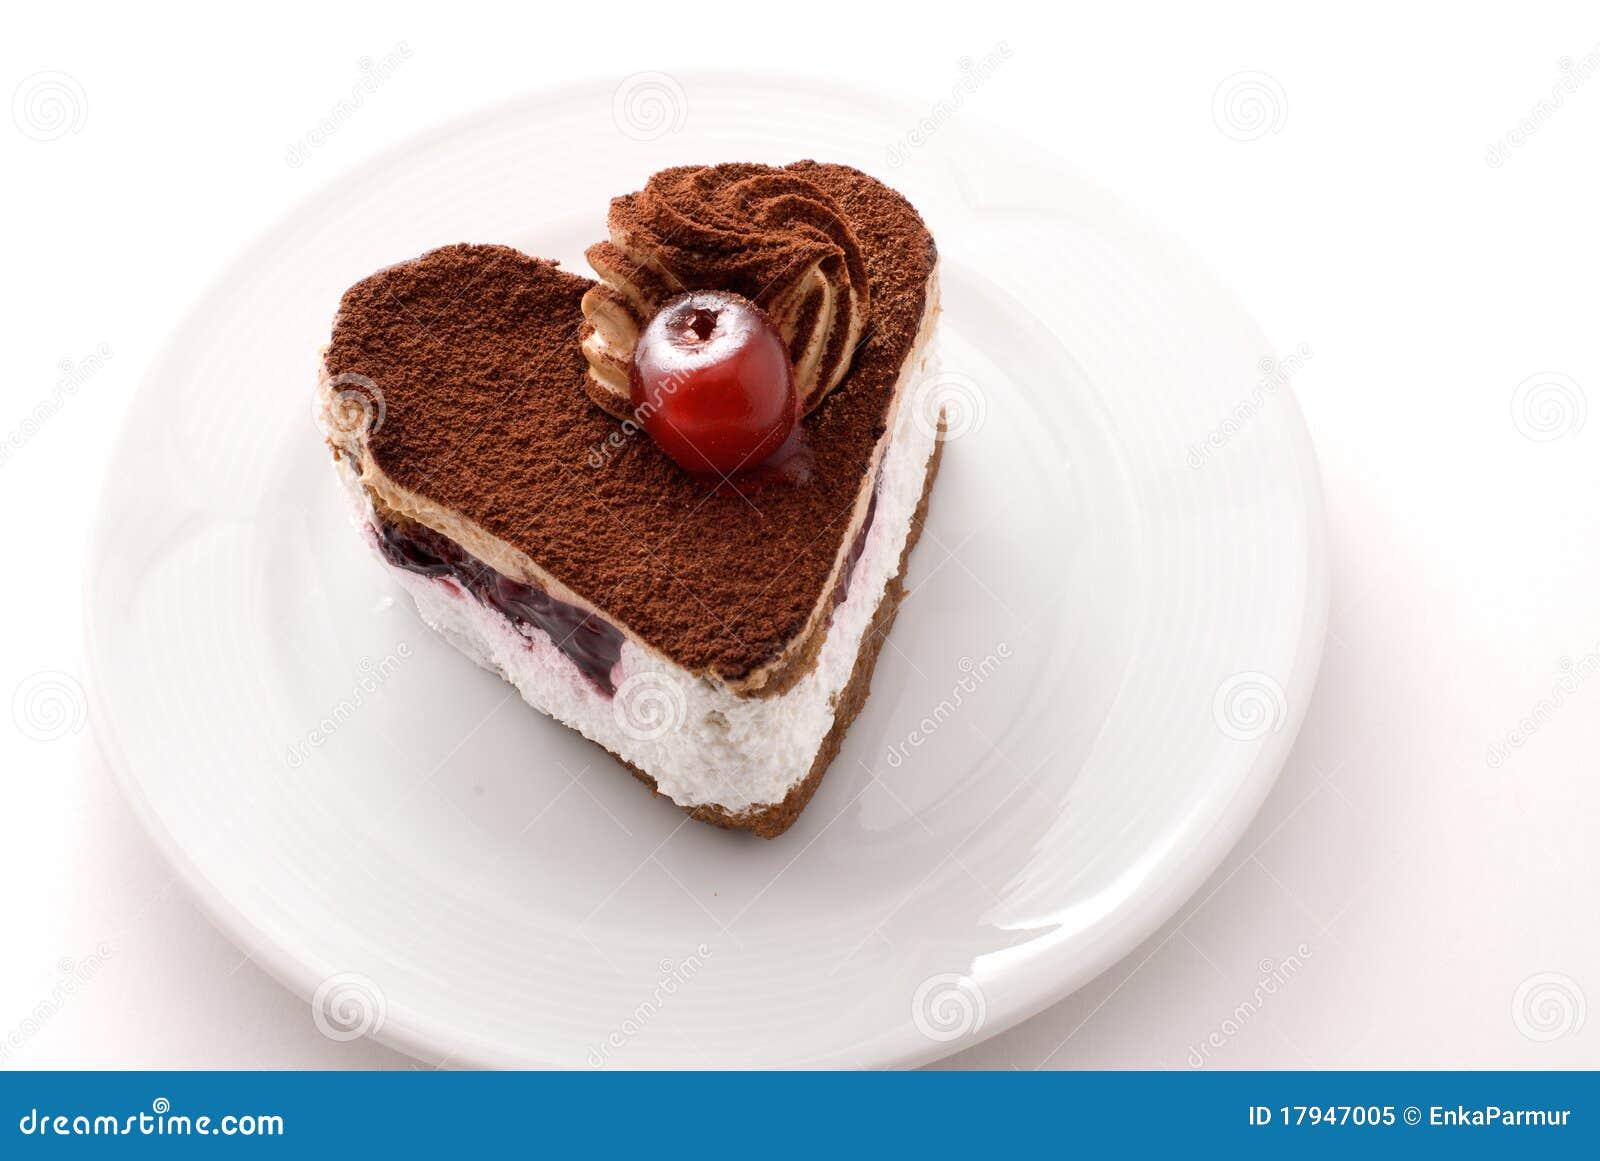 clip art heart shape cake - photo #50